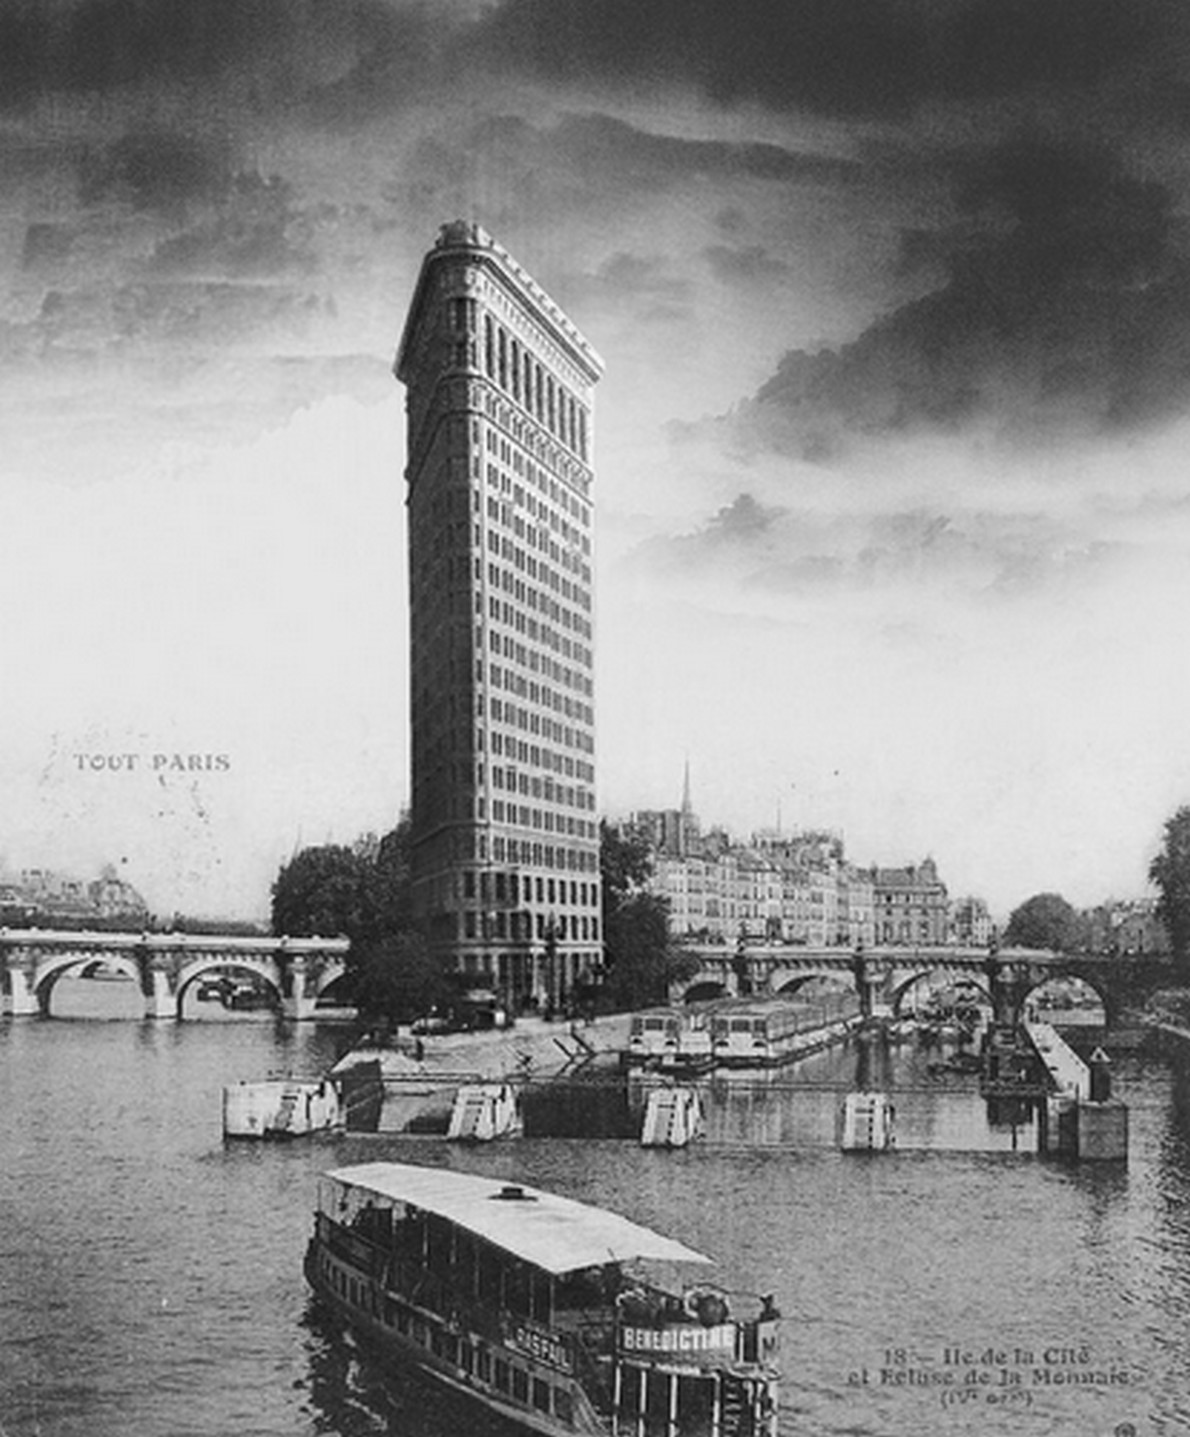 Edifici new yorkesi a Parigi